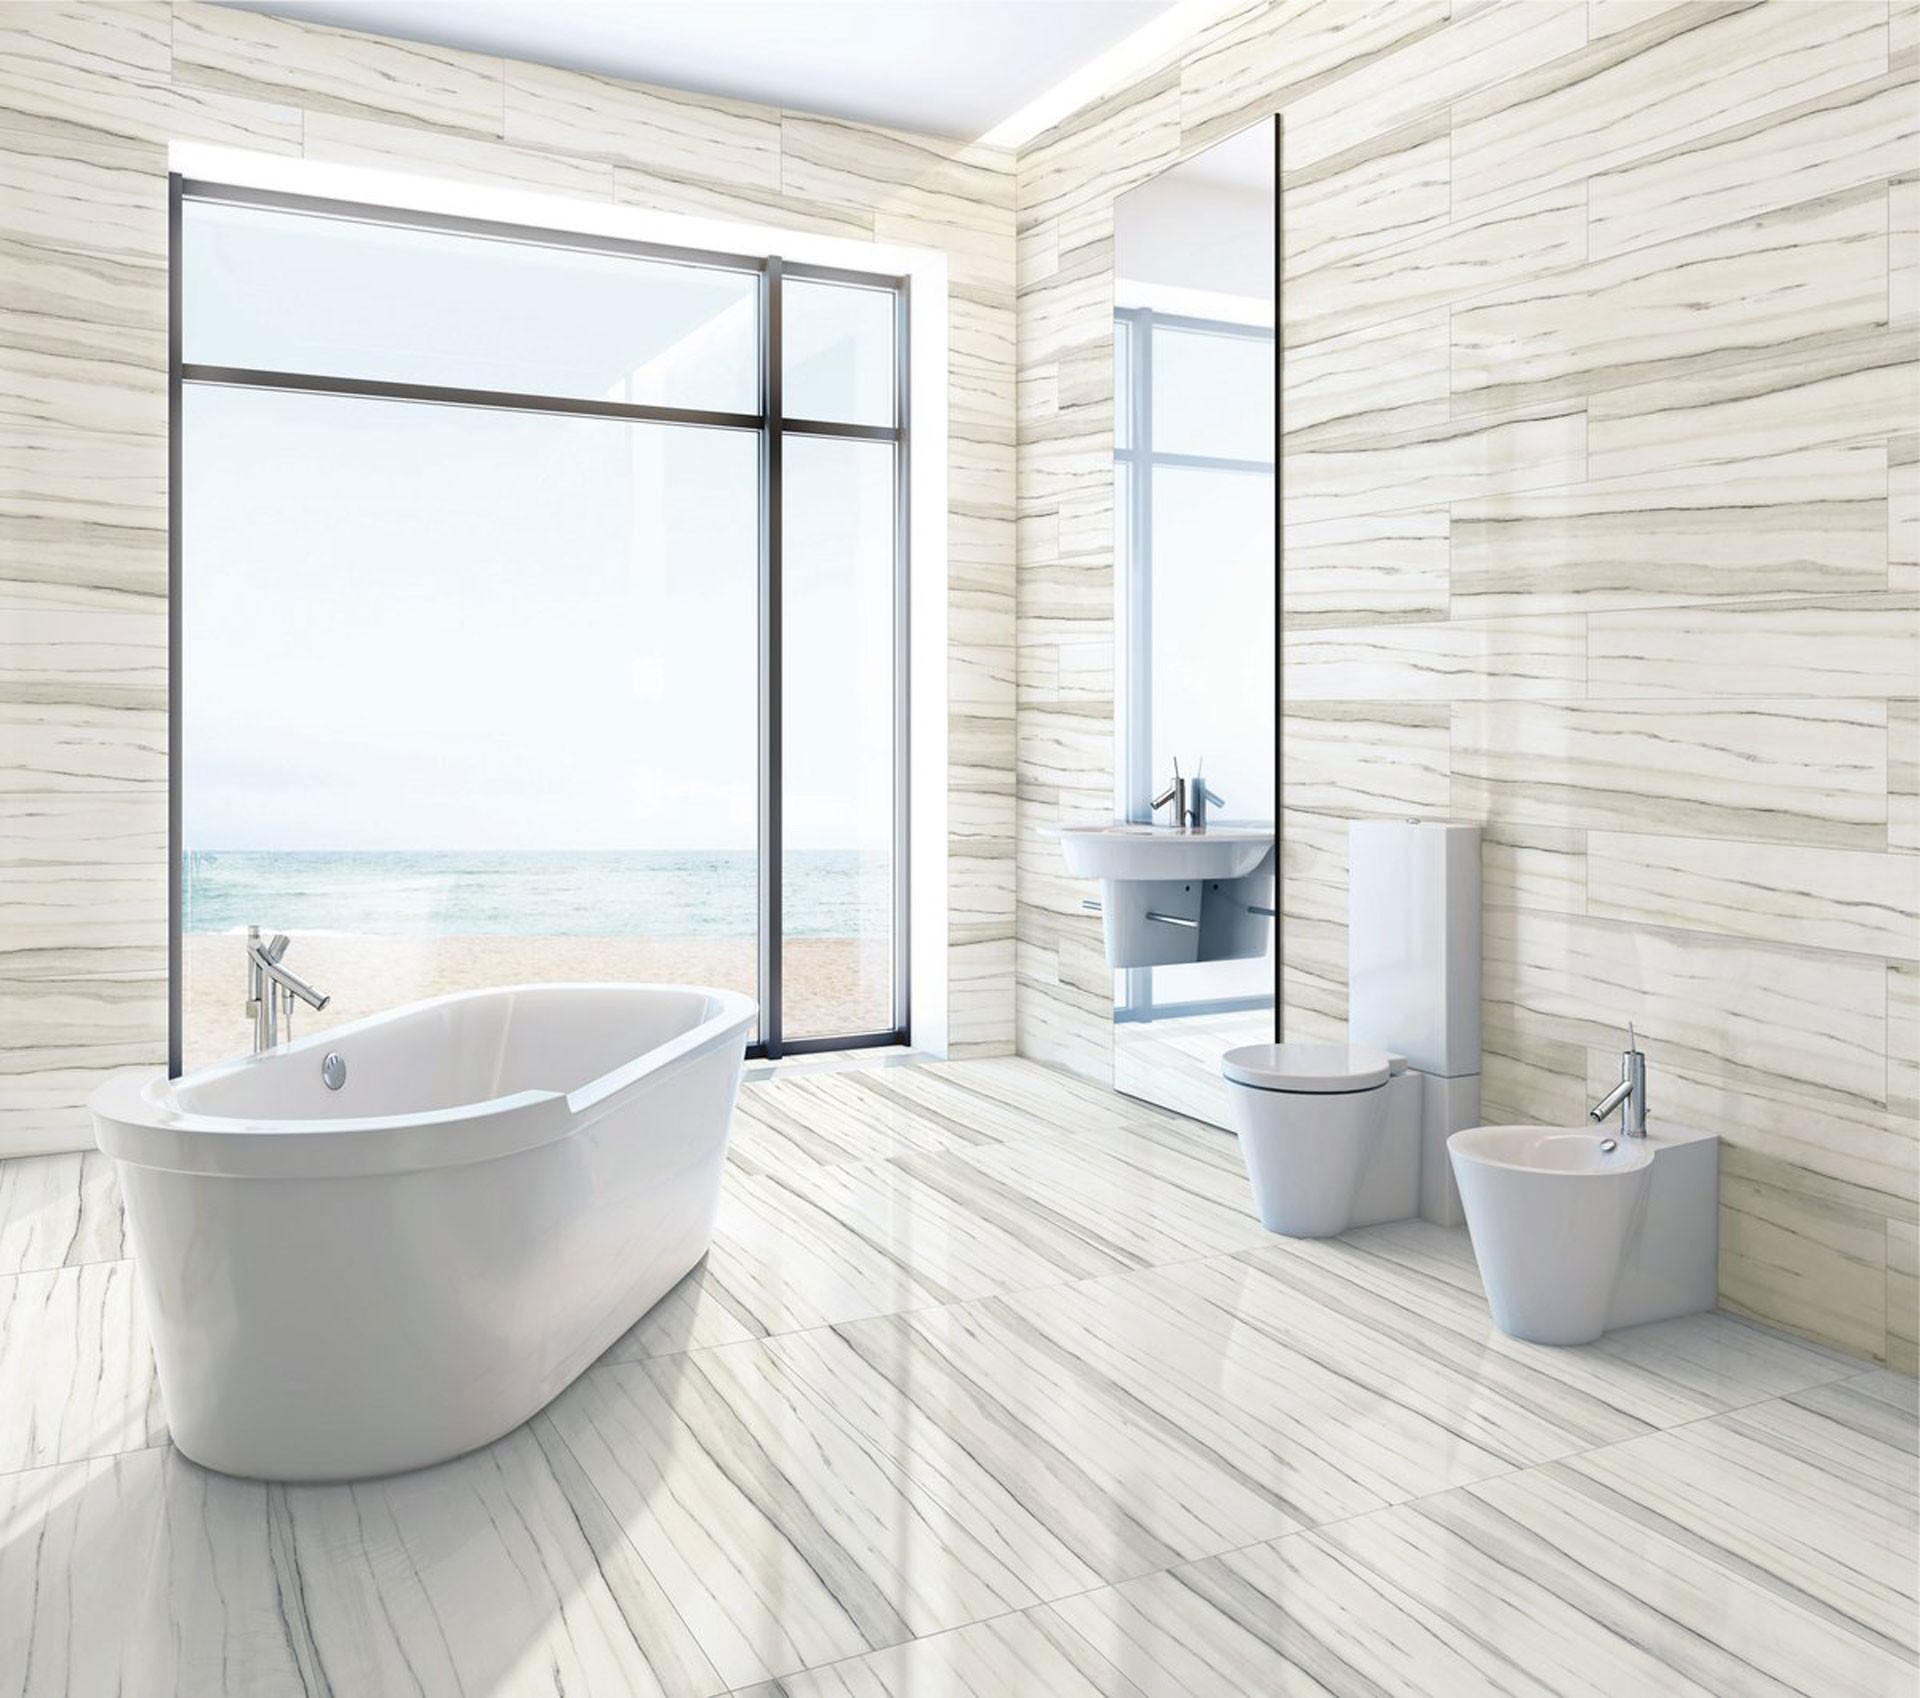 Bathroom Tile Floors  The contemporary bathroom with Stonepeak's porcelain floor